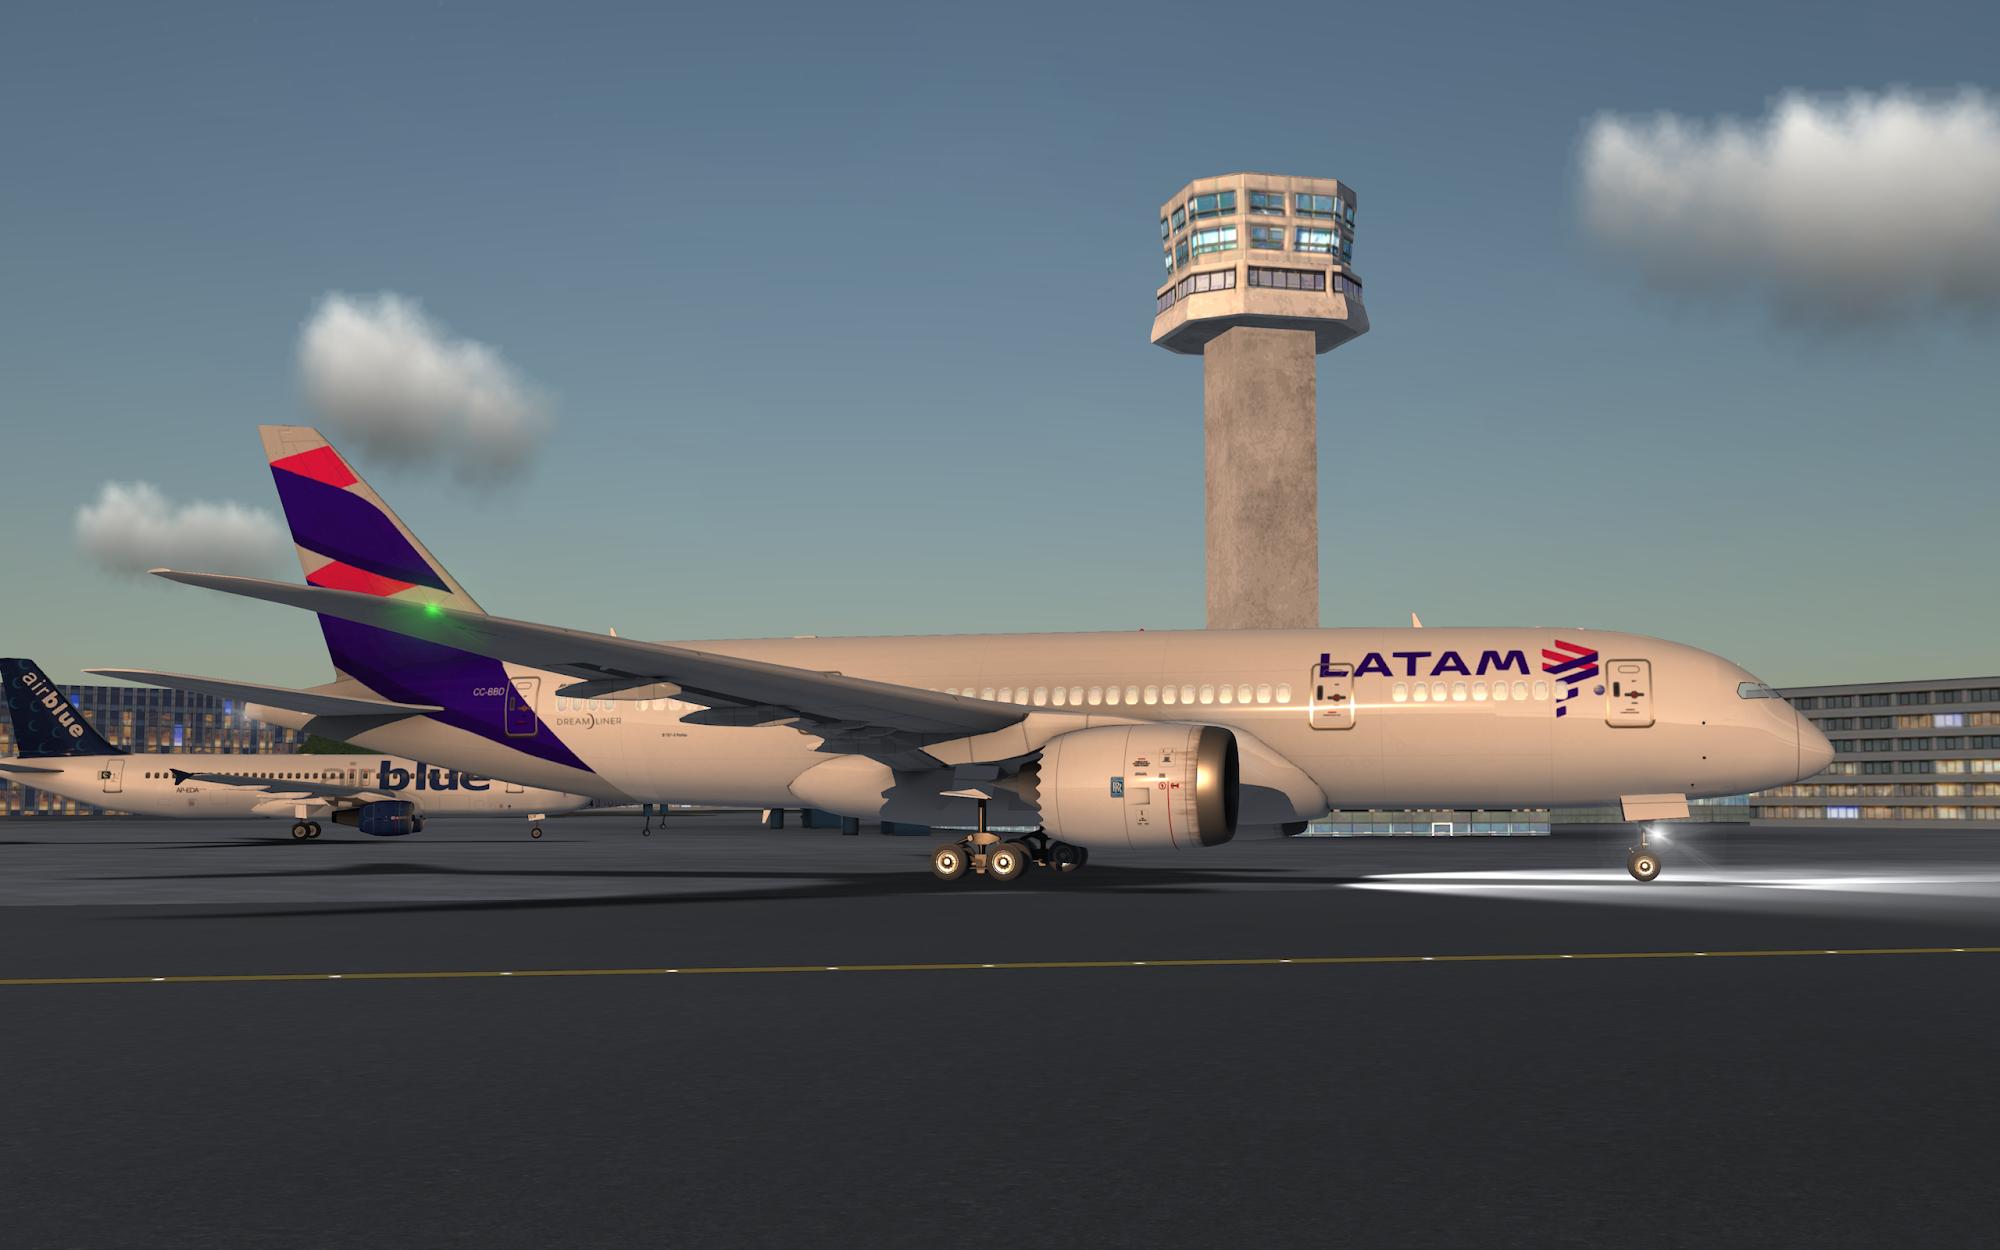 RFS - Real Flight Simulator скриншот 1